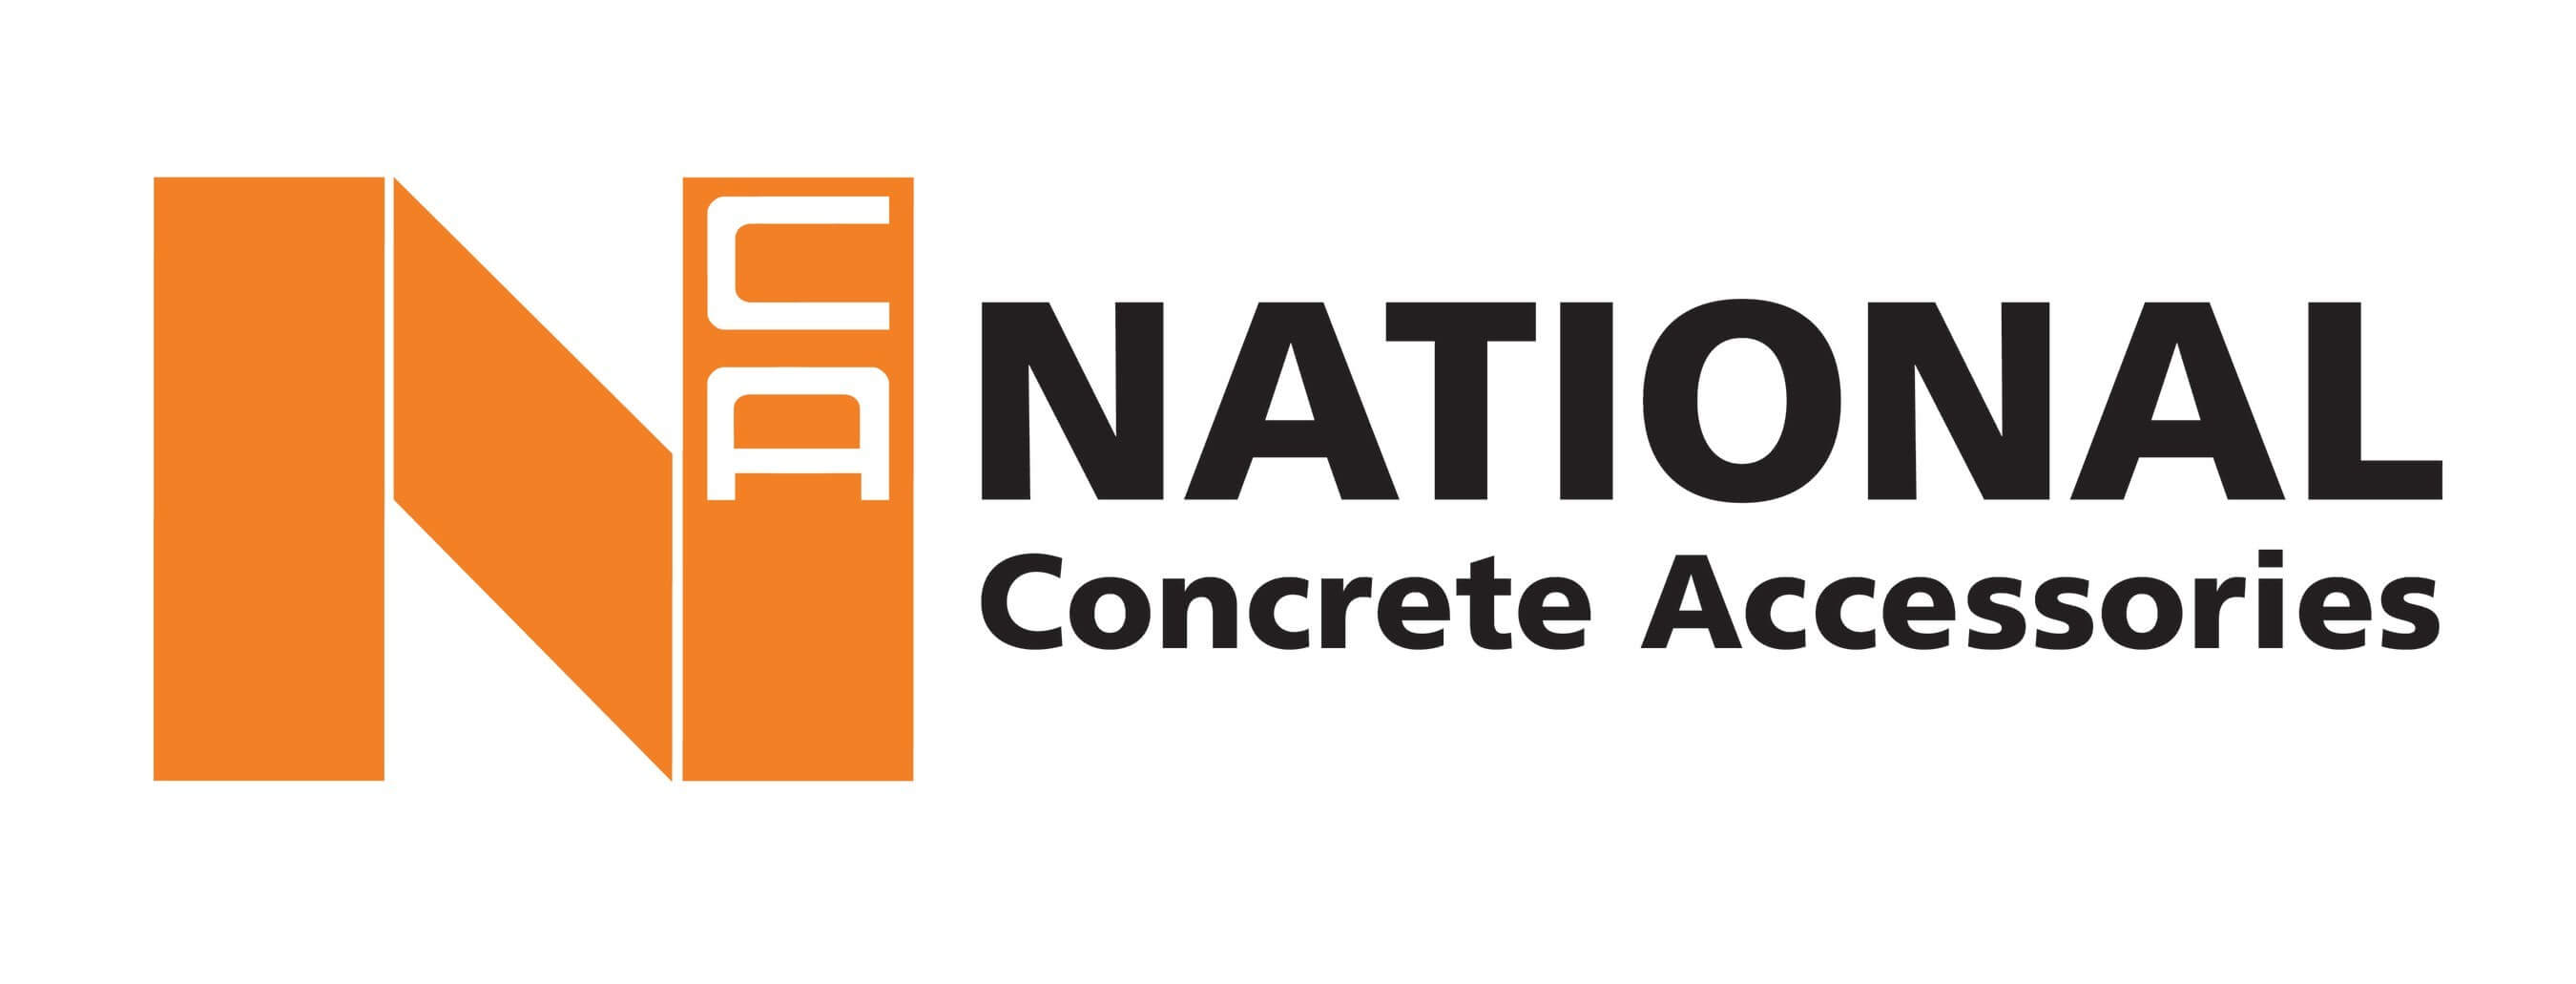 National Concrete Accessories-National Concrete Accessories Anno